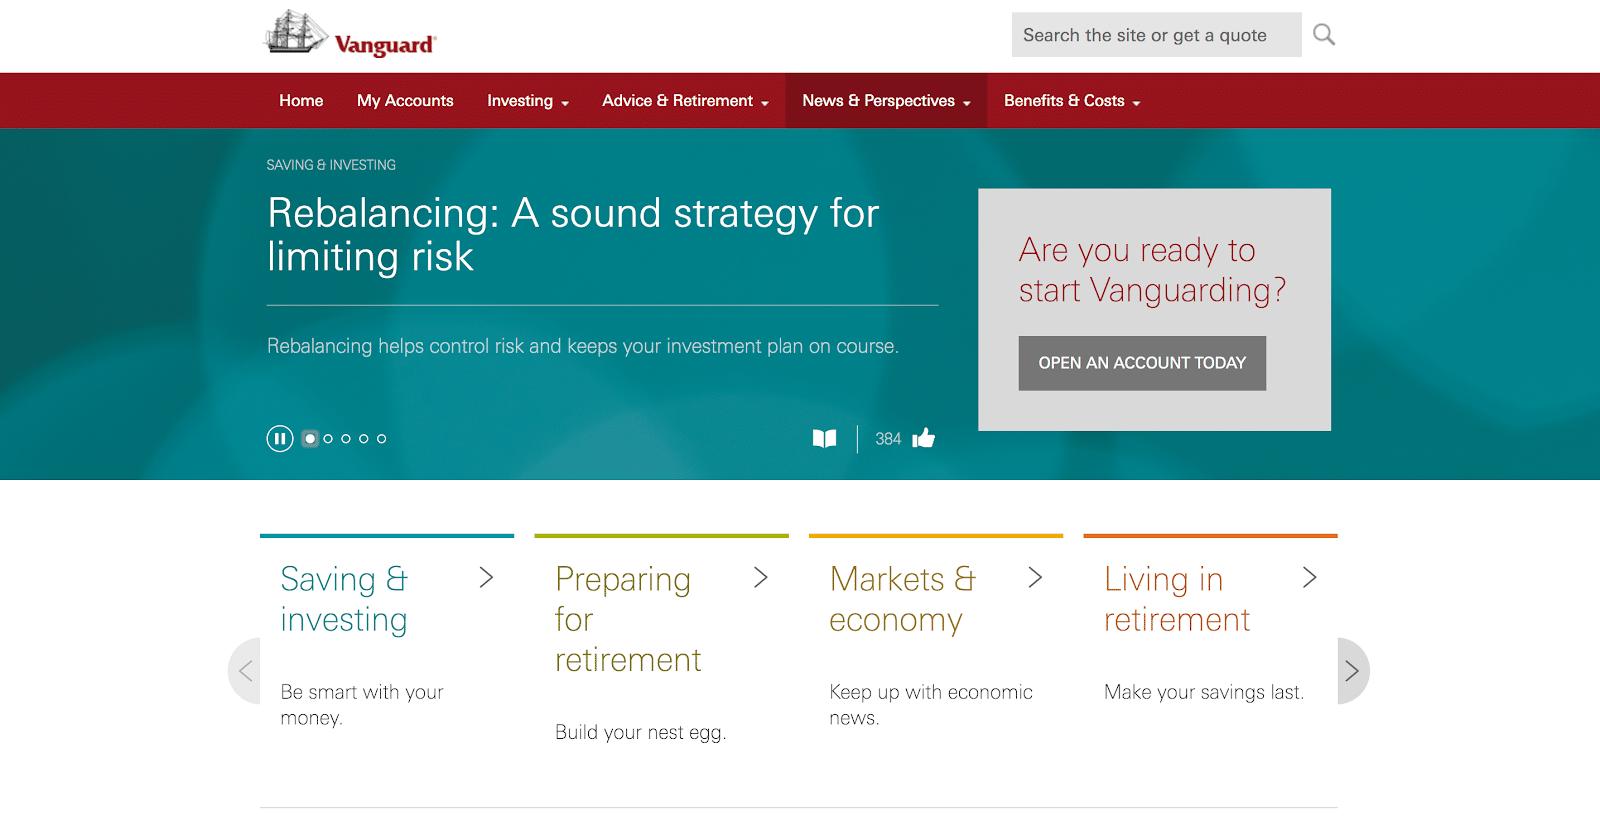 rebalancing limits risk quote